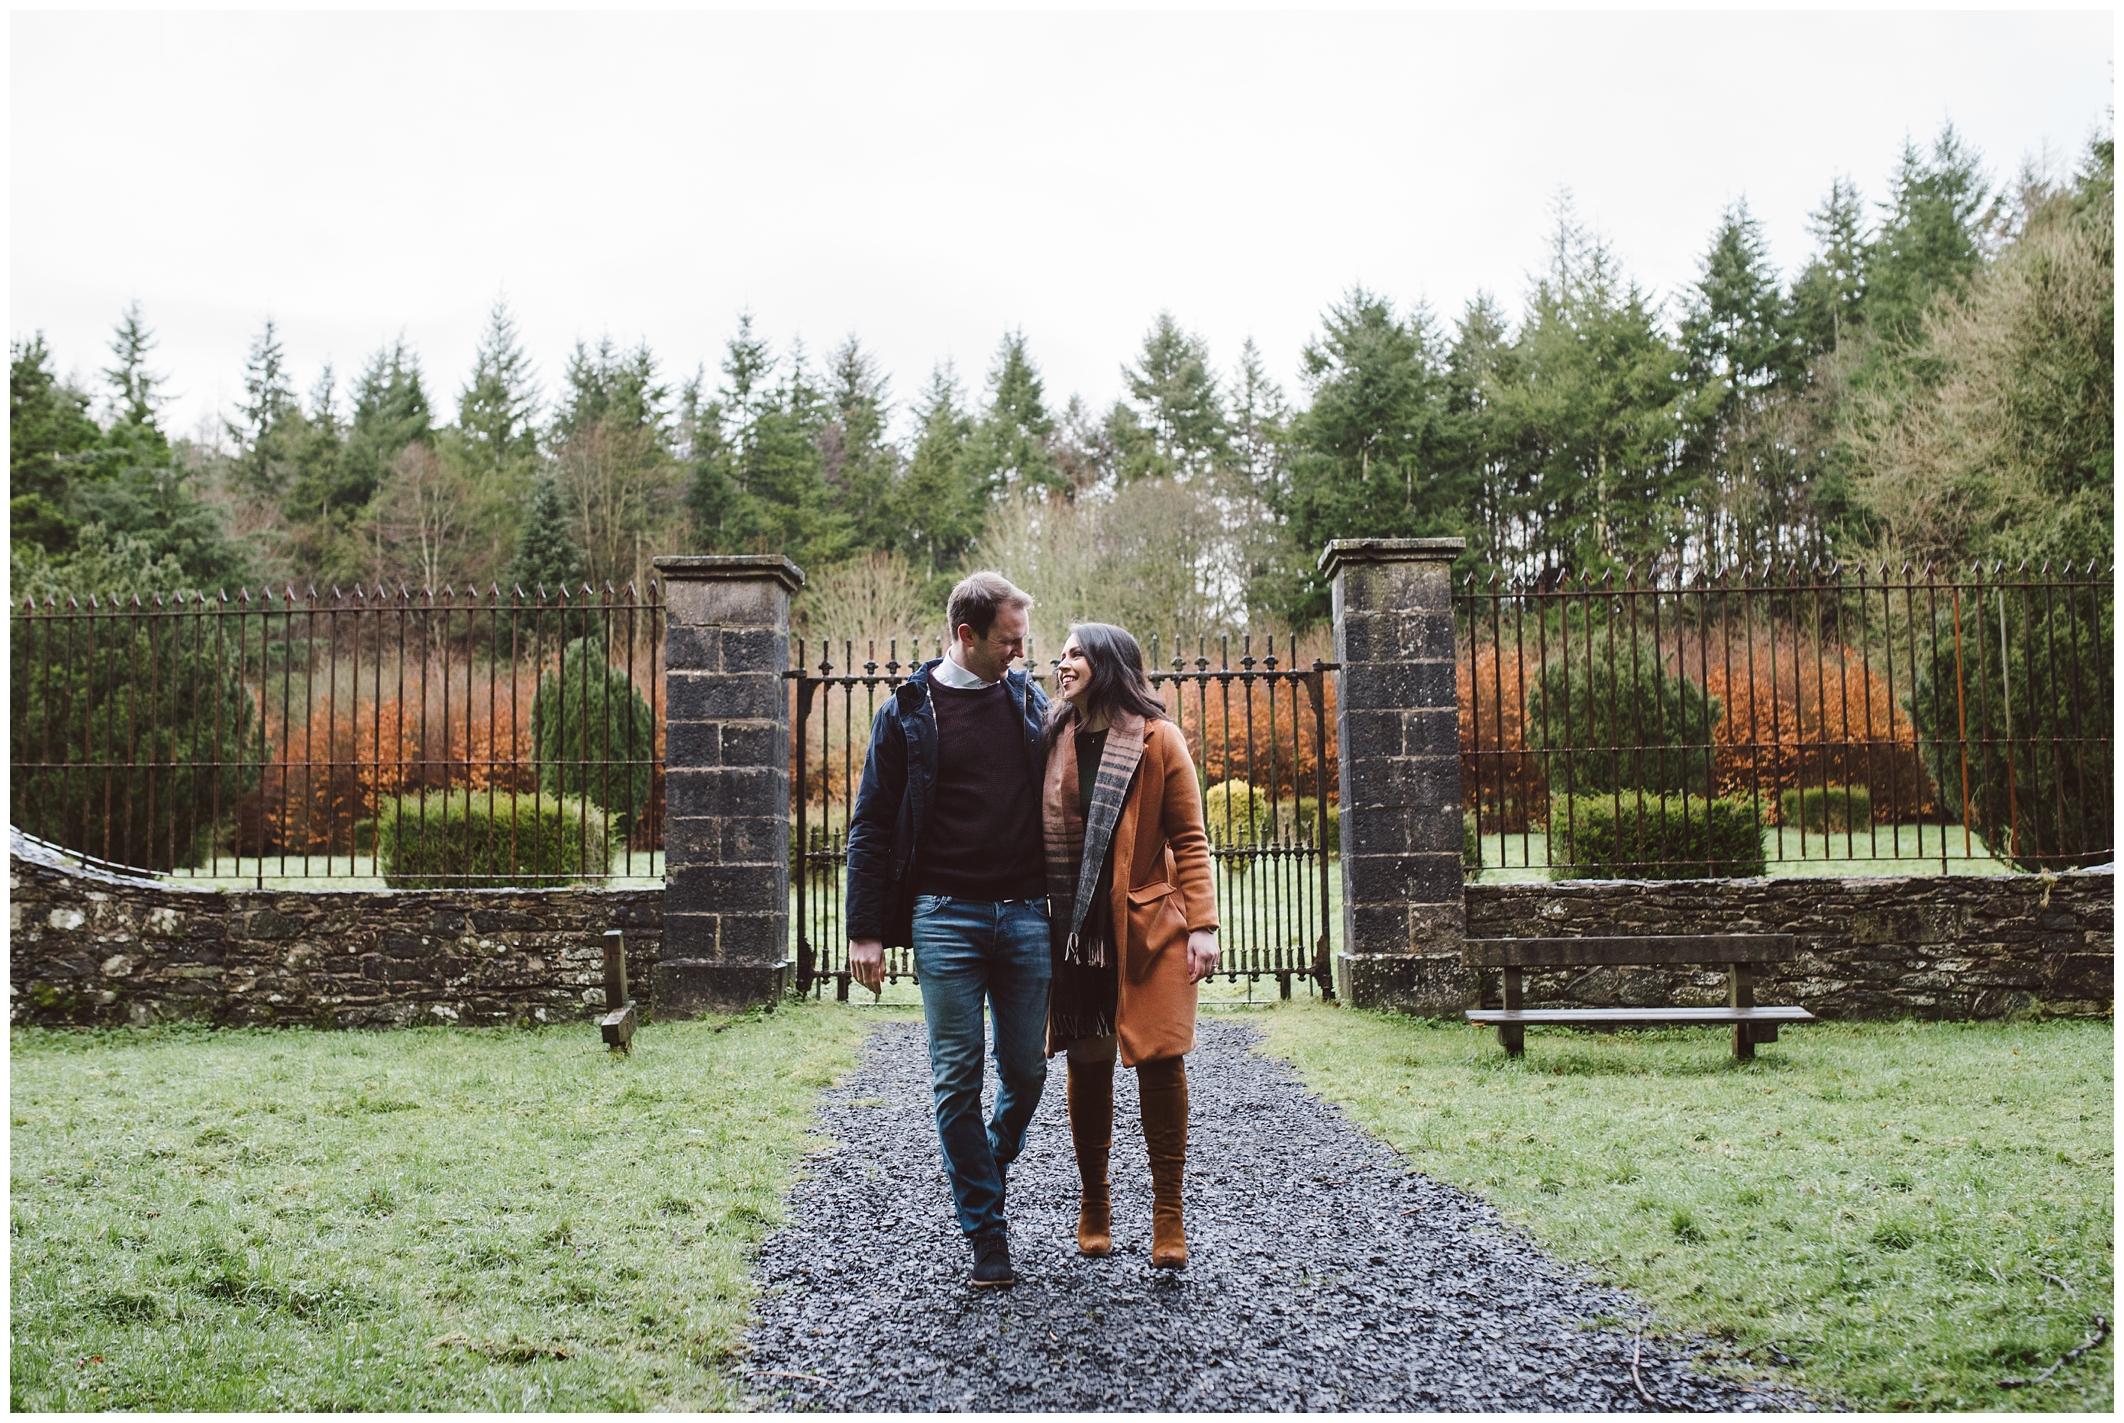 rossmore_park_monaghan_pre_wedding_jude_browne_photography_0047.jpg